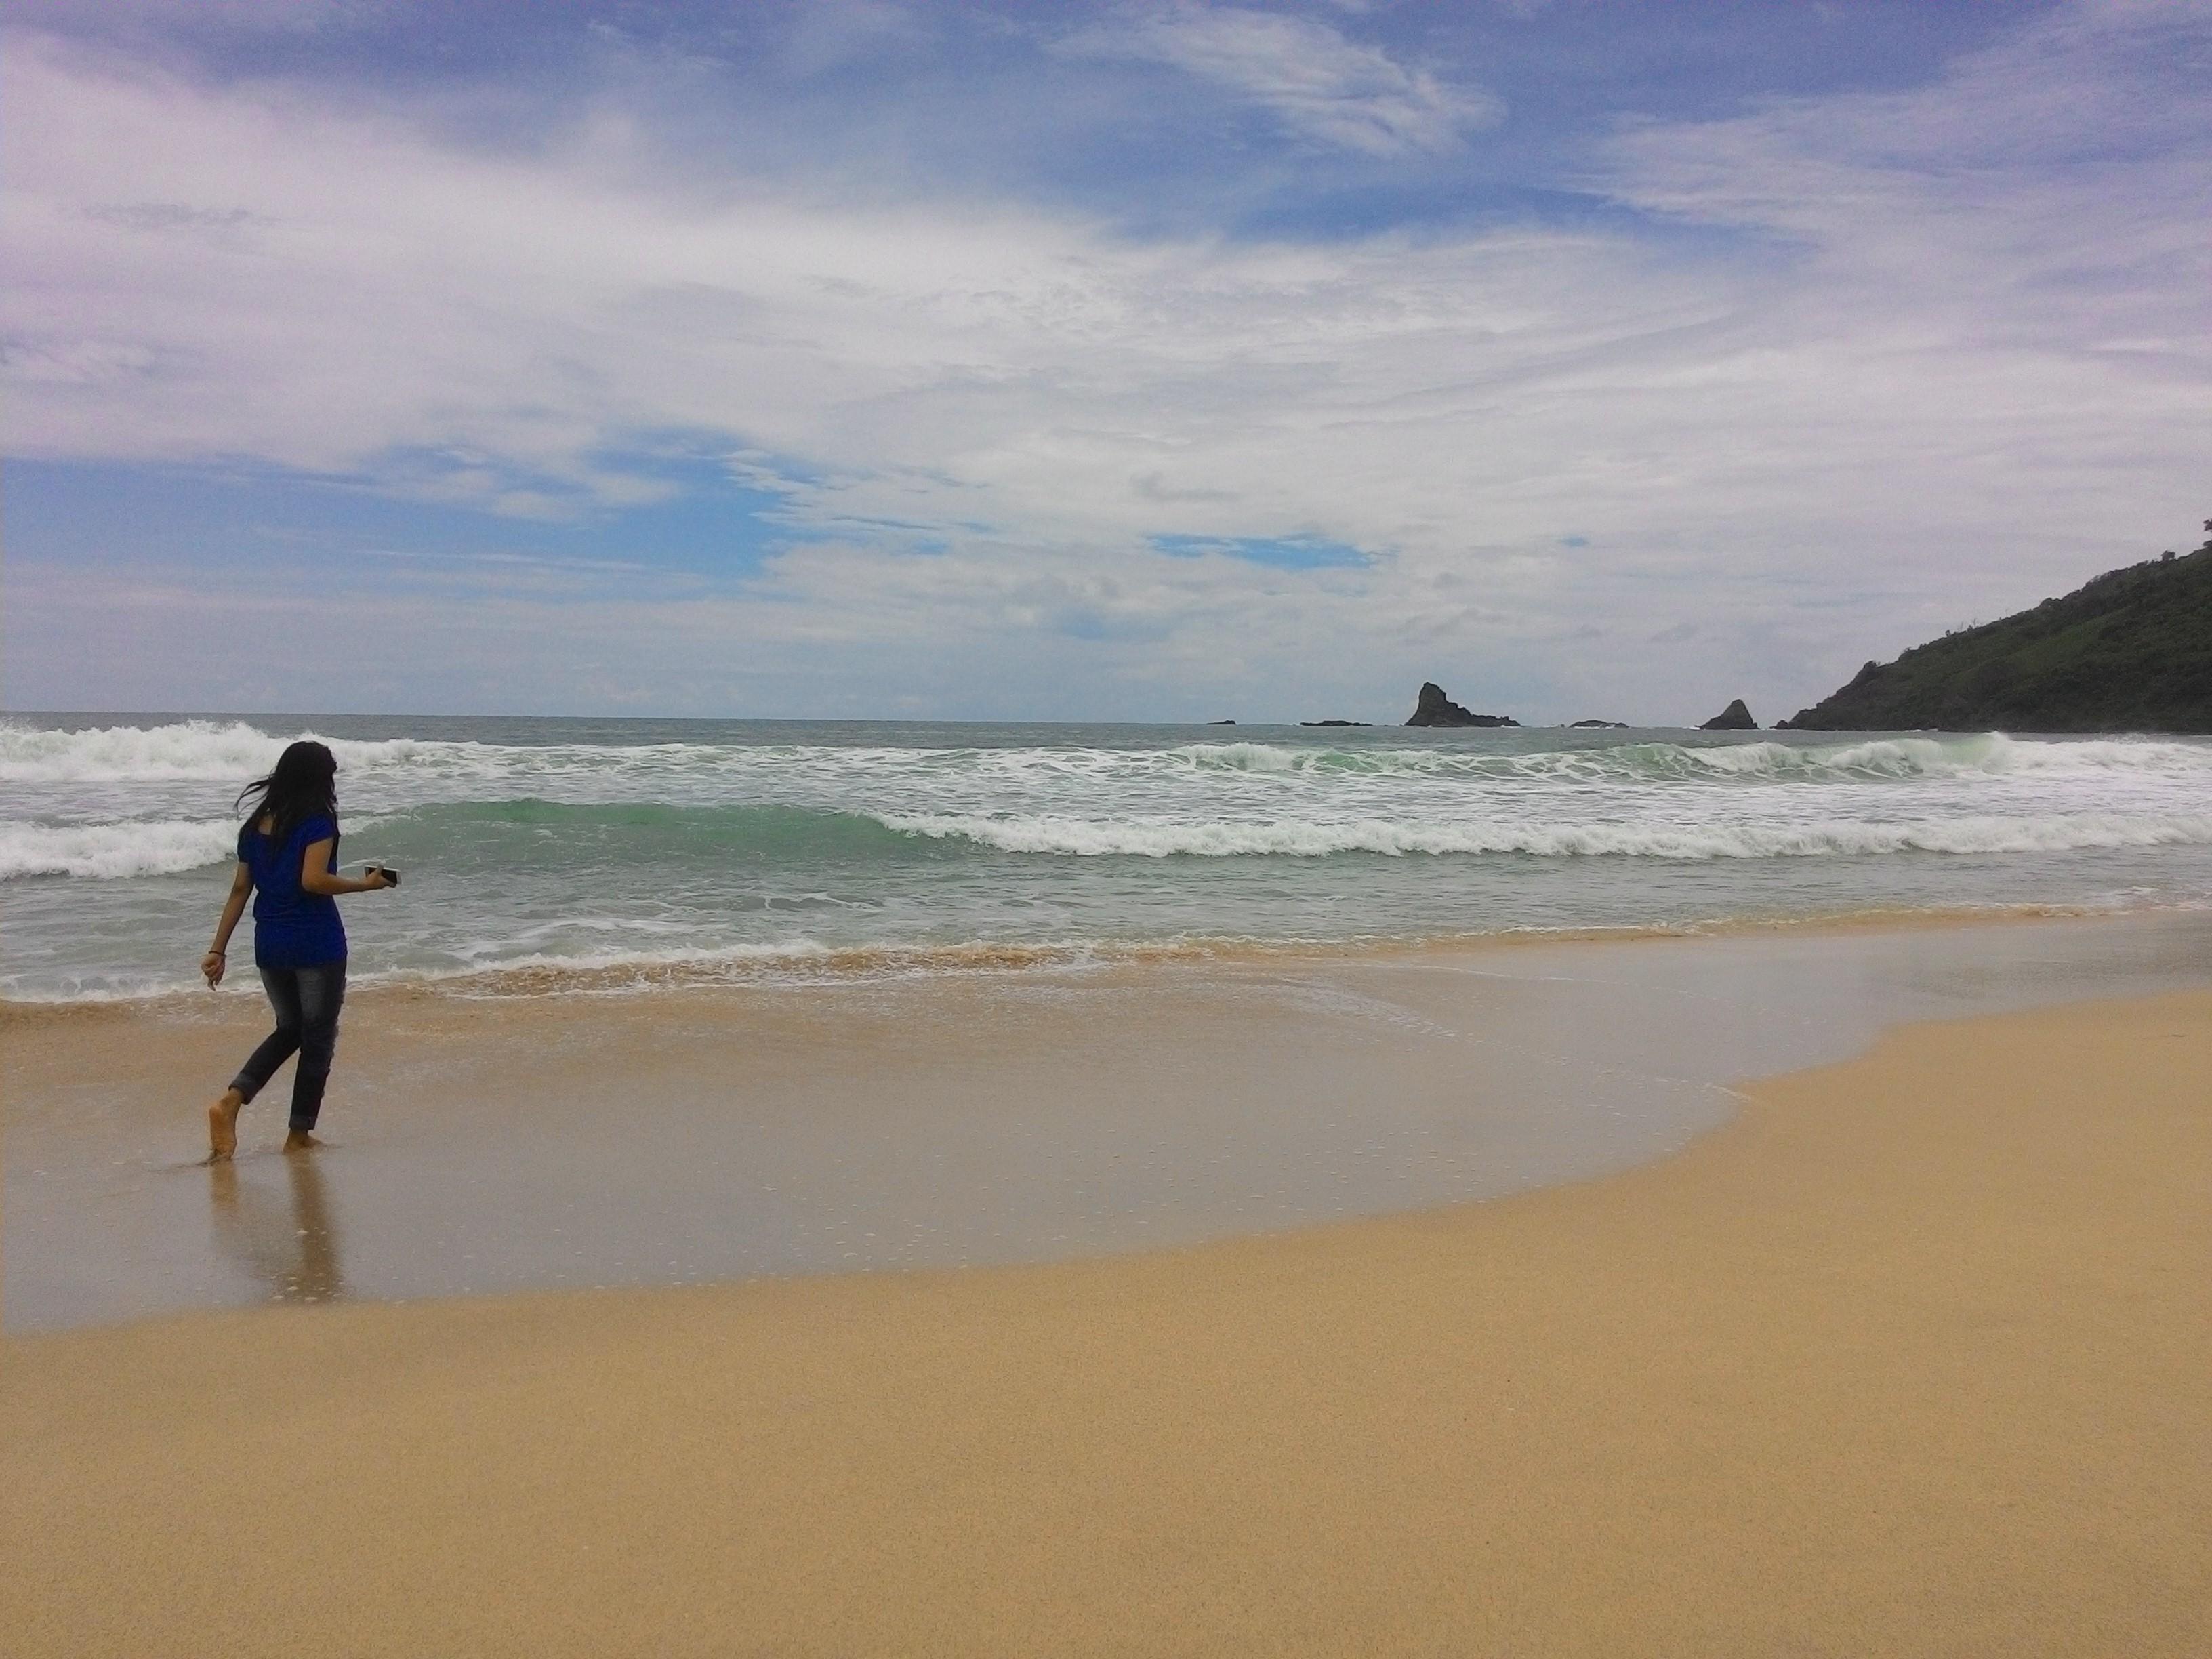 Pantai Teluk Mekaki Lombok Barat Gerbang Wisata Tour Adventure Pura